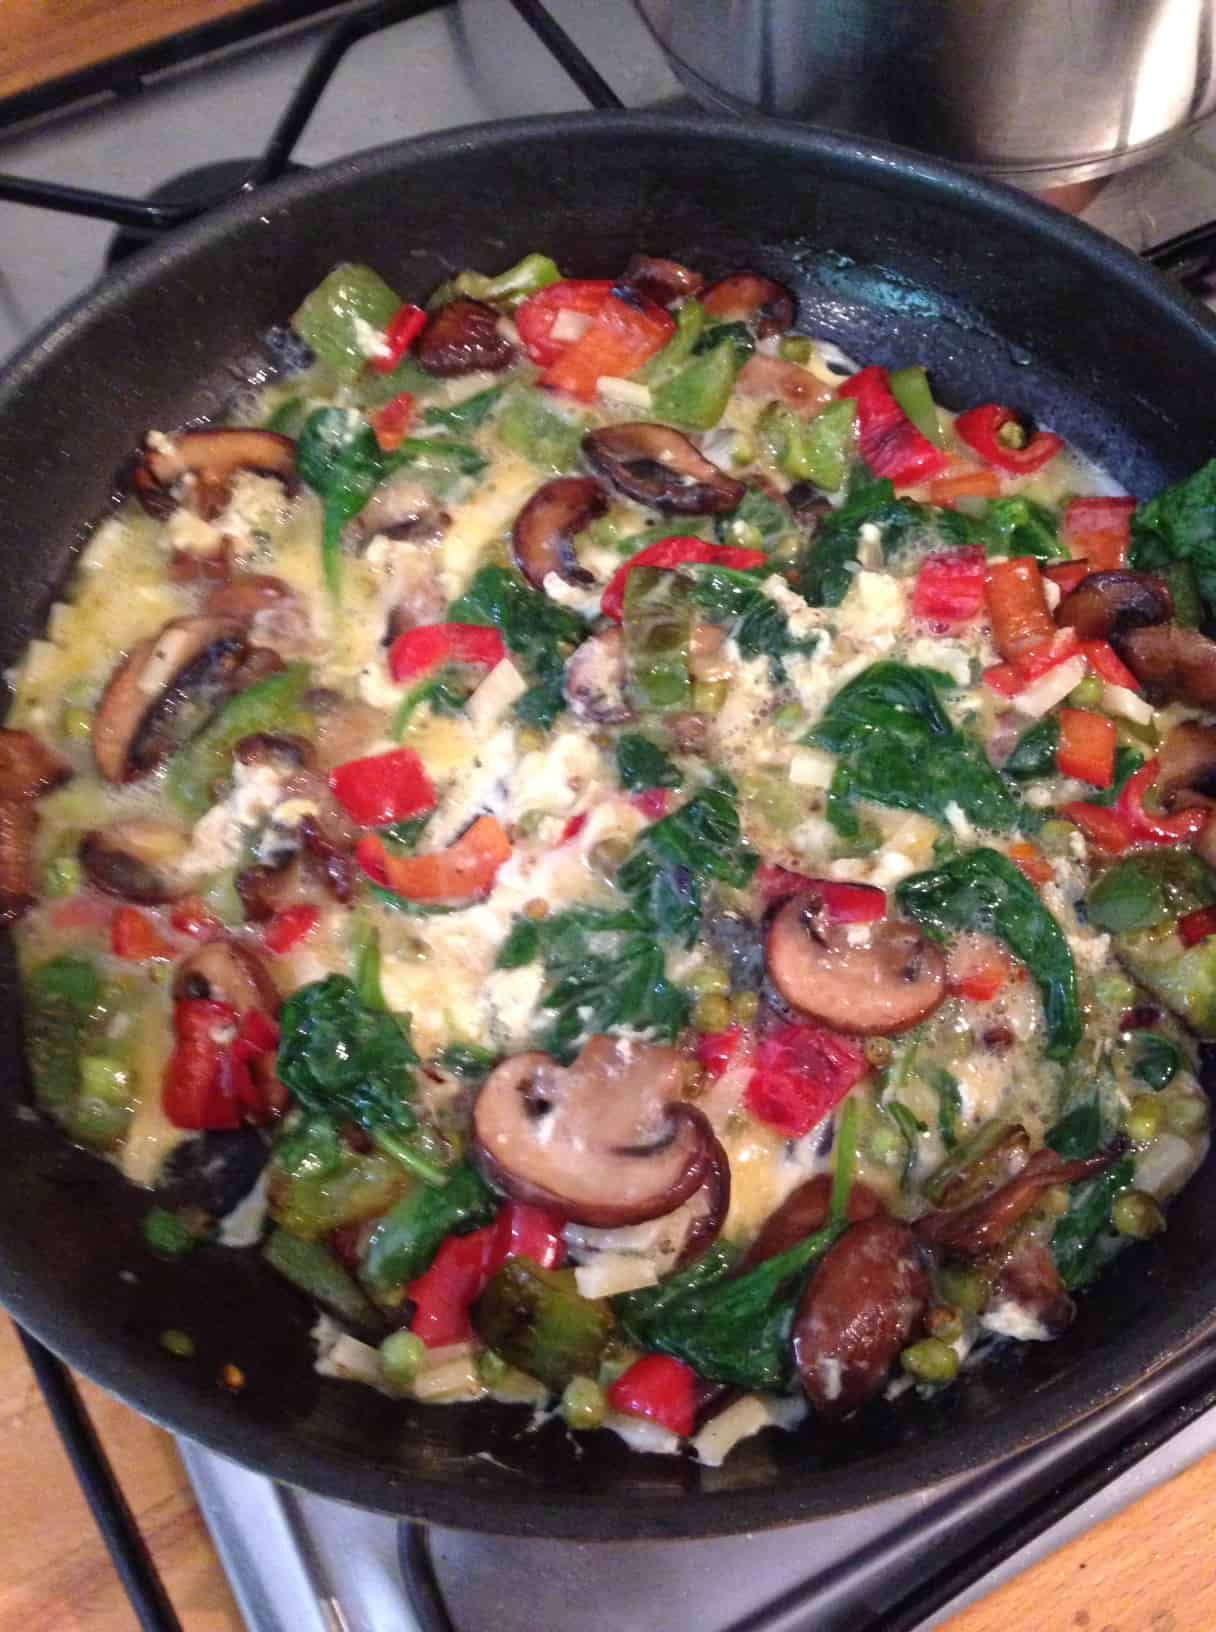 Family friendly meal – basic frittata recipe